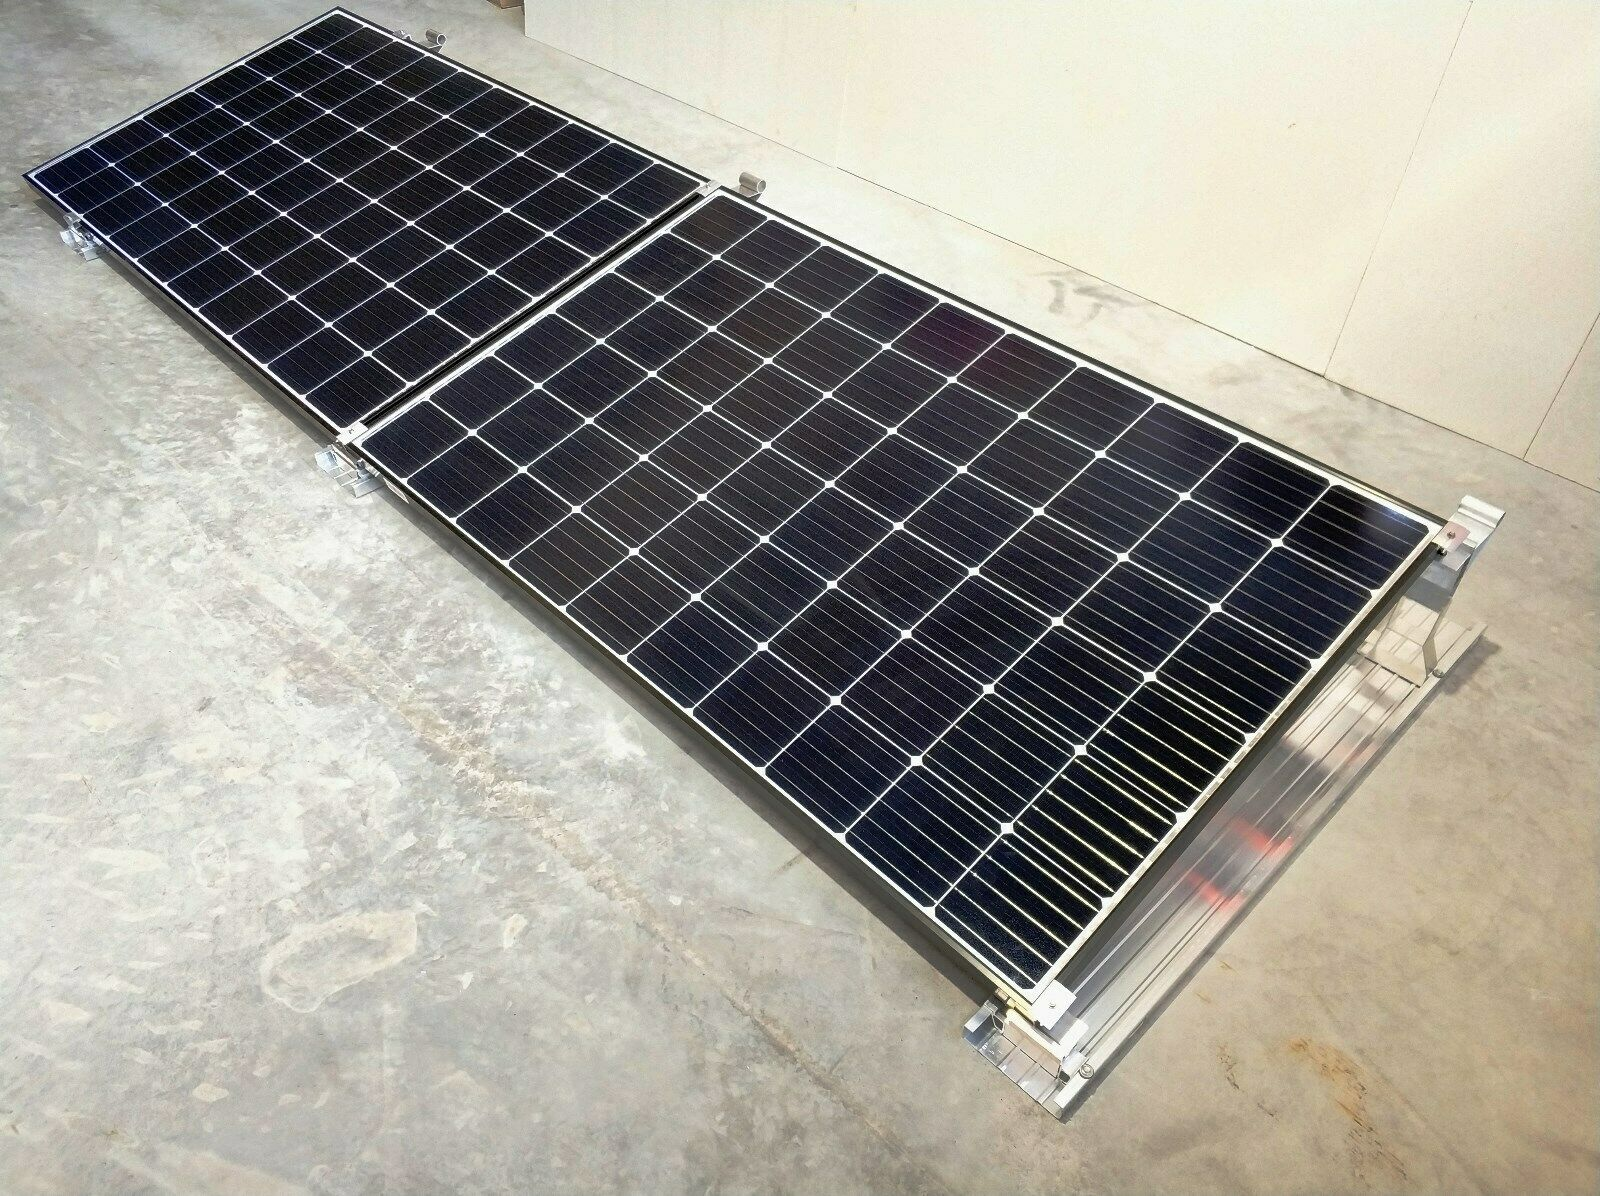 Solarenergie Solarmodul Halterung Befestigung Solarhalterung Solaranlage Dachbefestigung 51cm Sophisticated Technologies